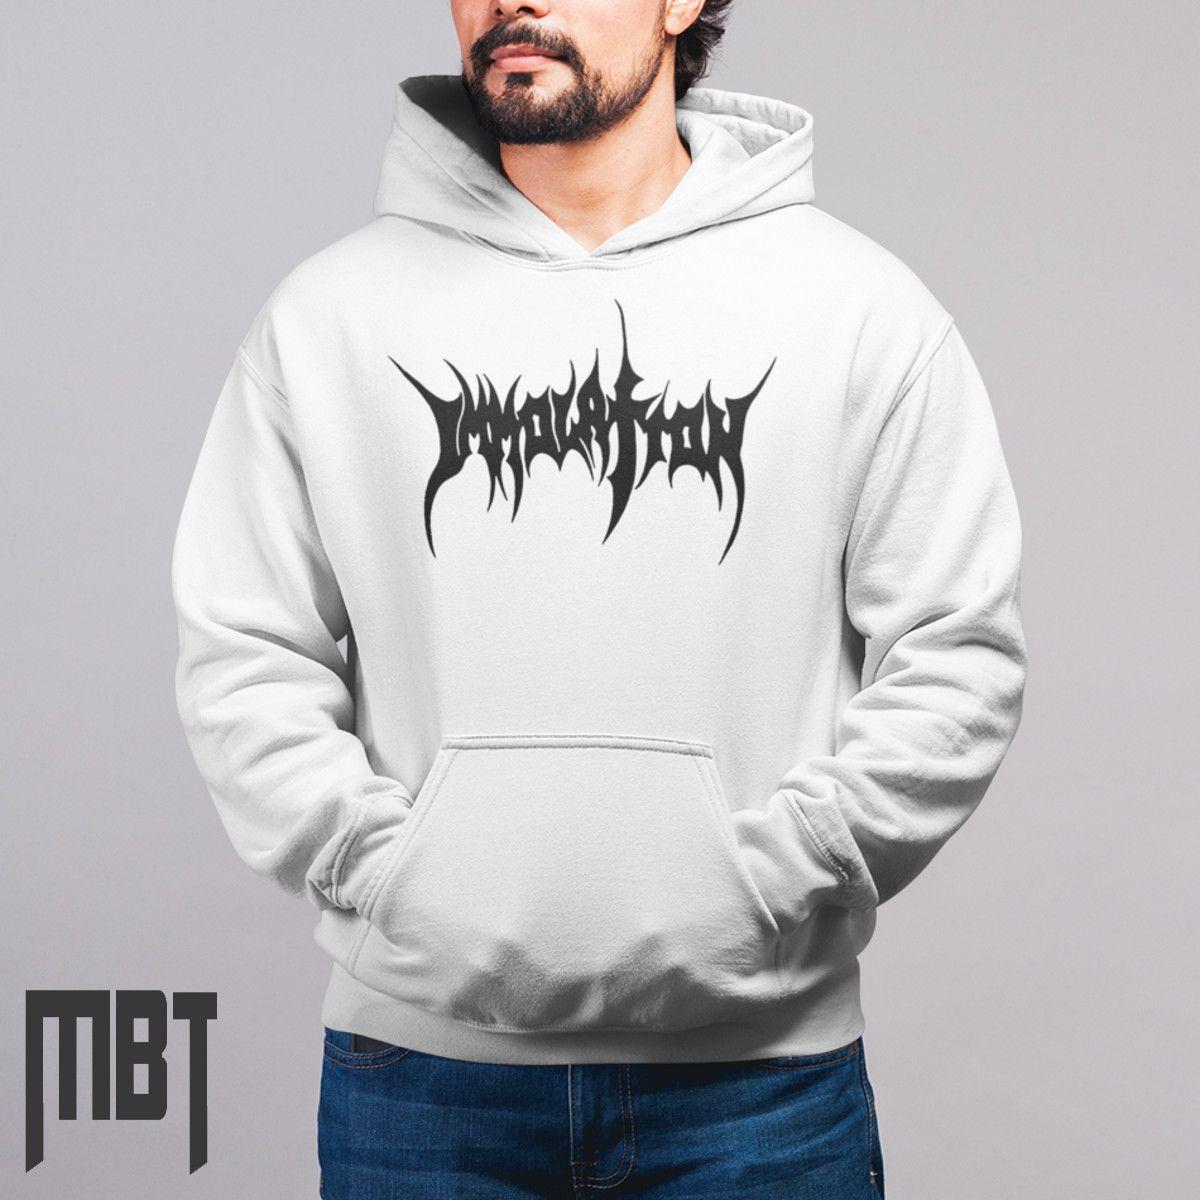 Immolation Band Hoodie, Immolation Logo Hooded Sweatshirt ...